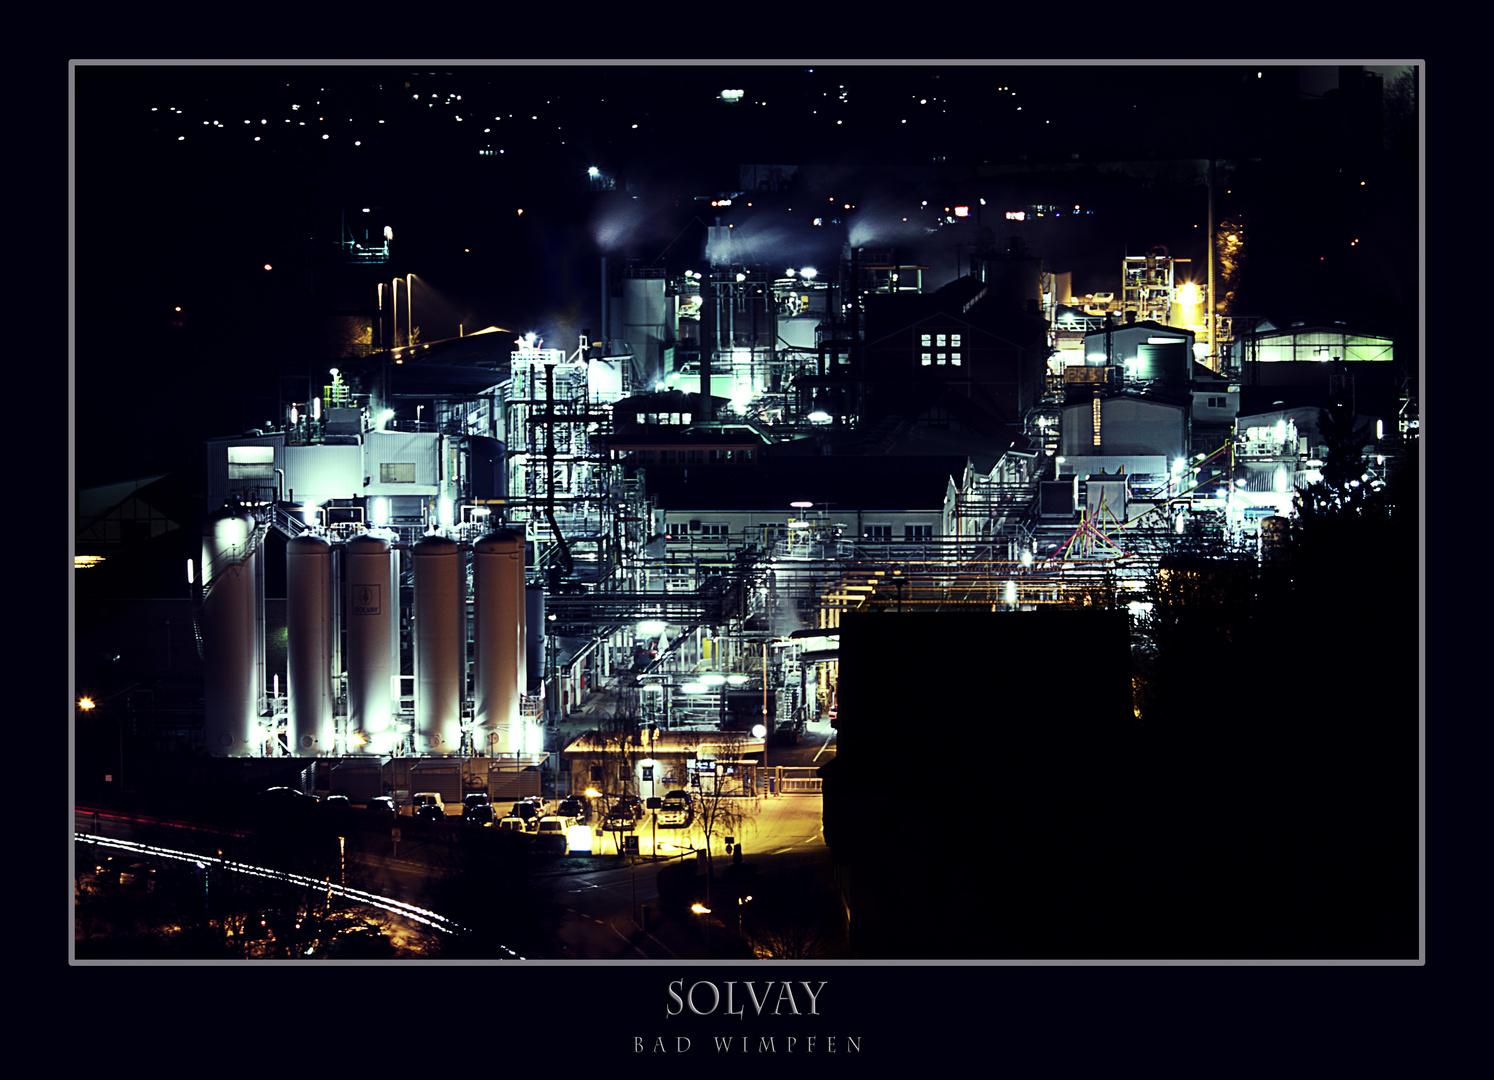 Solvay, Bad Wimpfen